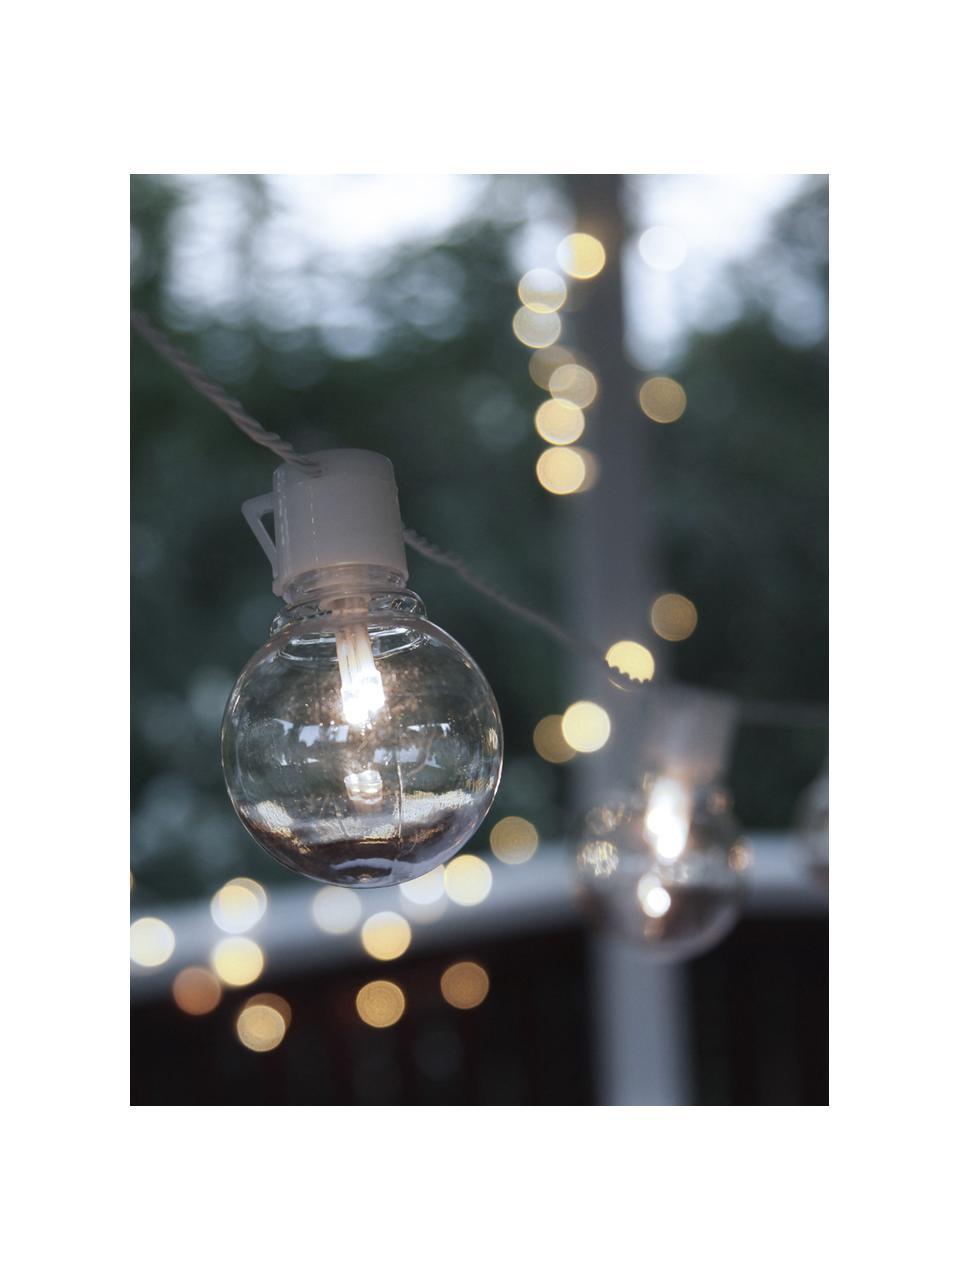 LED-Lichterkette Partaj, 950 cm, 16 Lampions, Lampions: Kunststoff, Weiß, L 950 cm